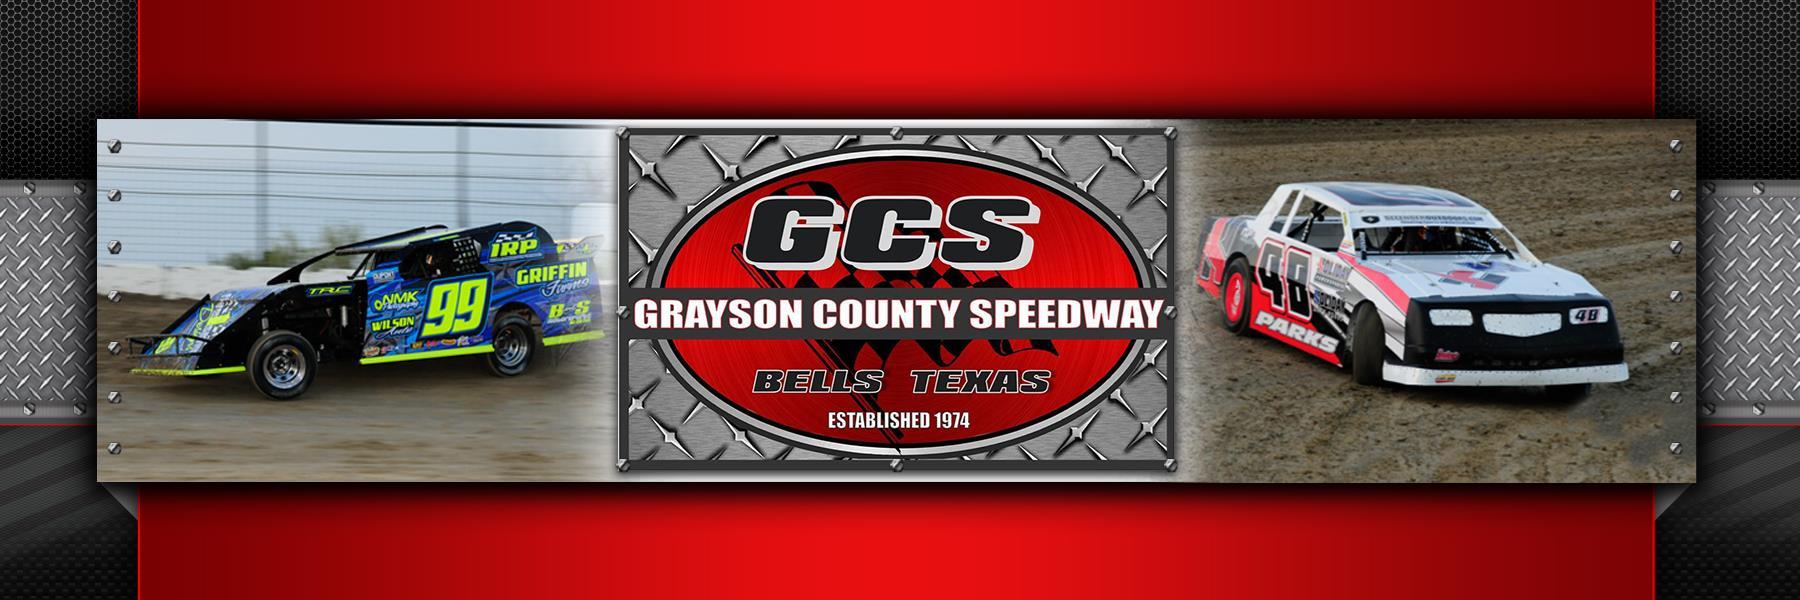 9/11/2021 - Grayson County Speedway